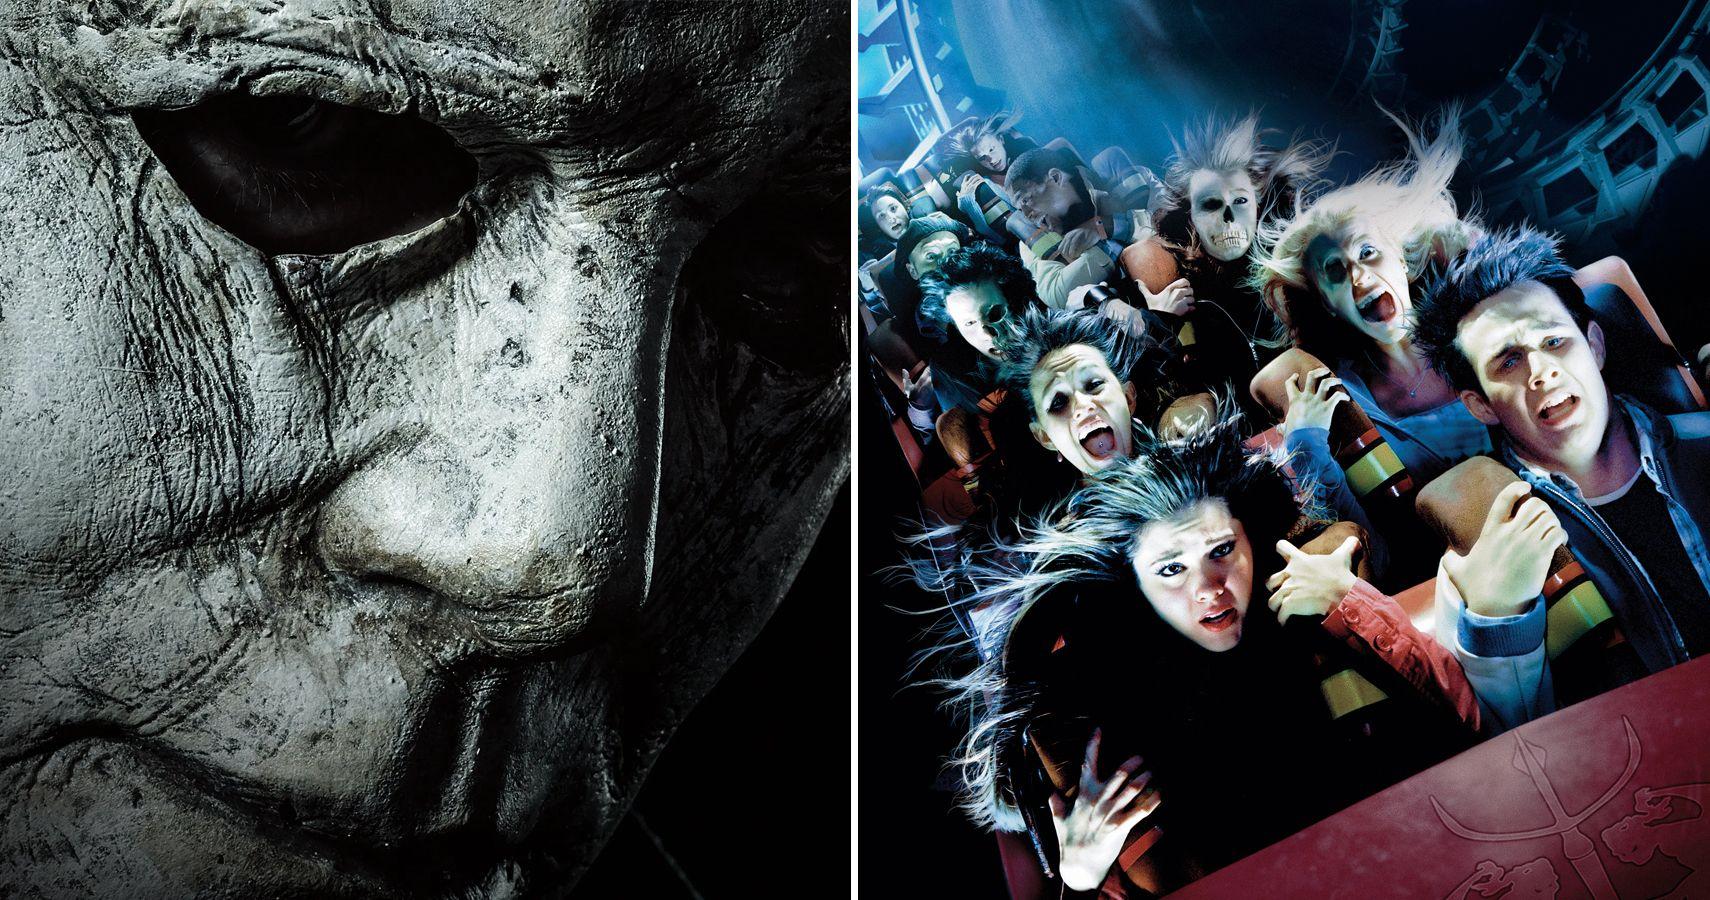 The 10 Best Horror Movie Sequels According To IMDb | ScreenRant